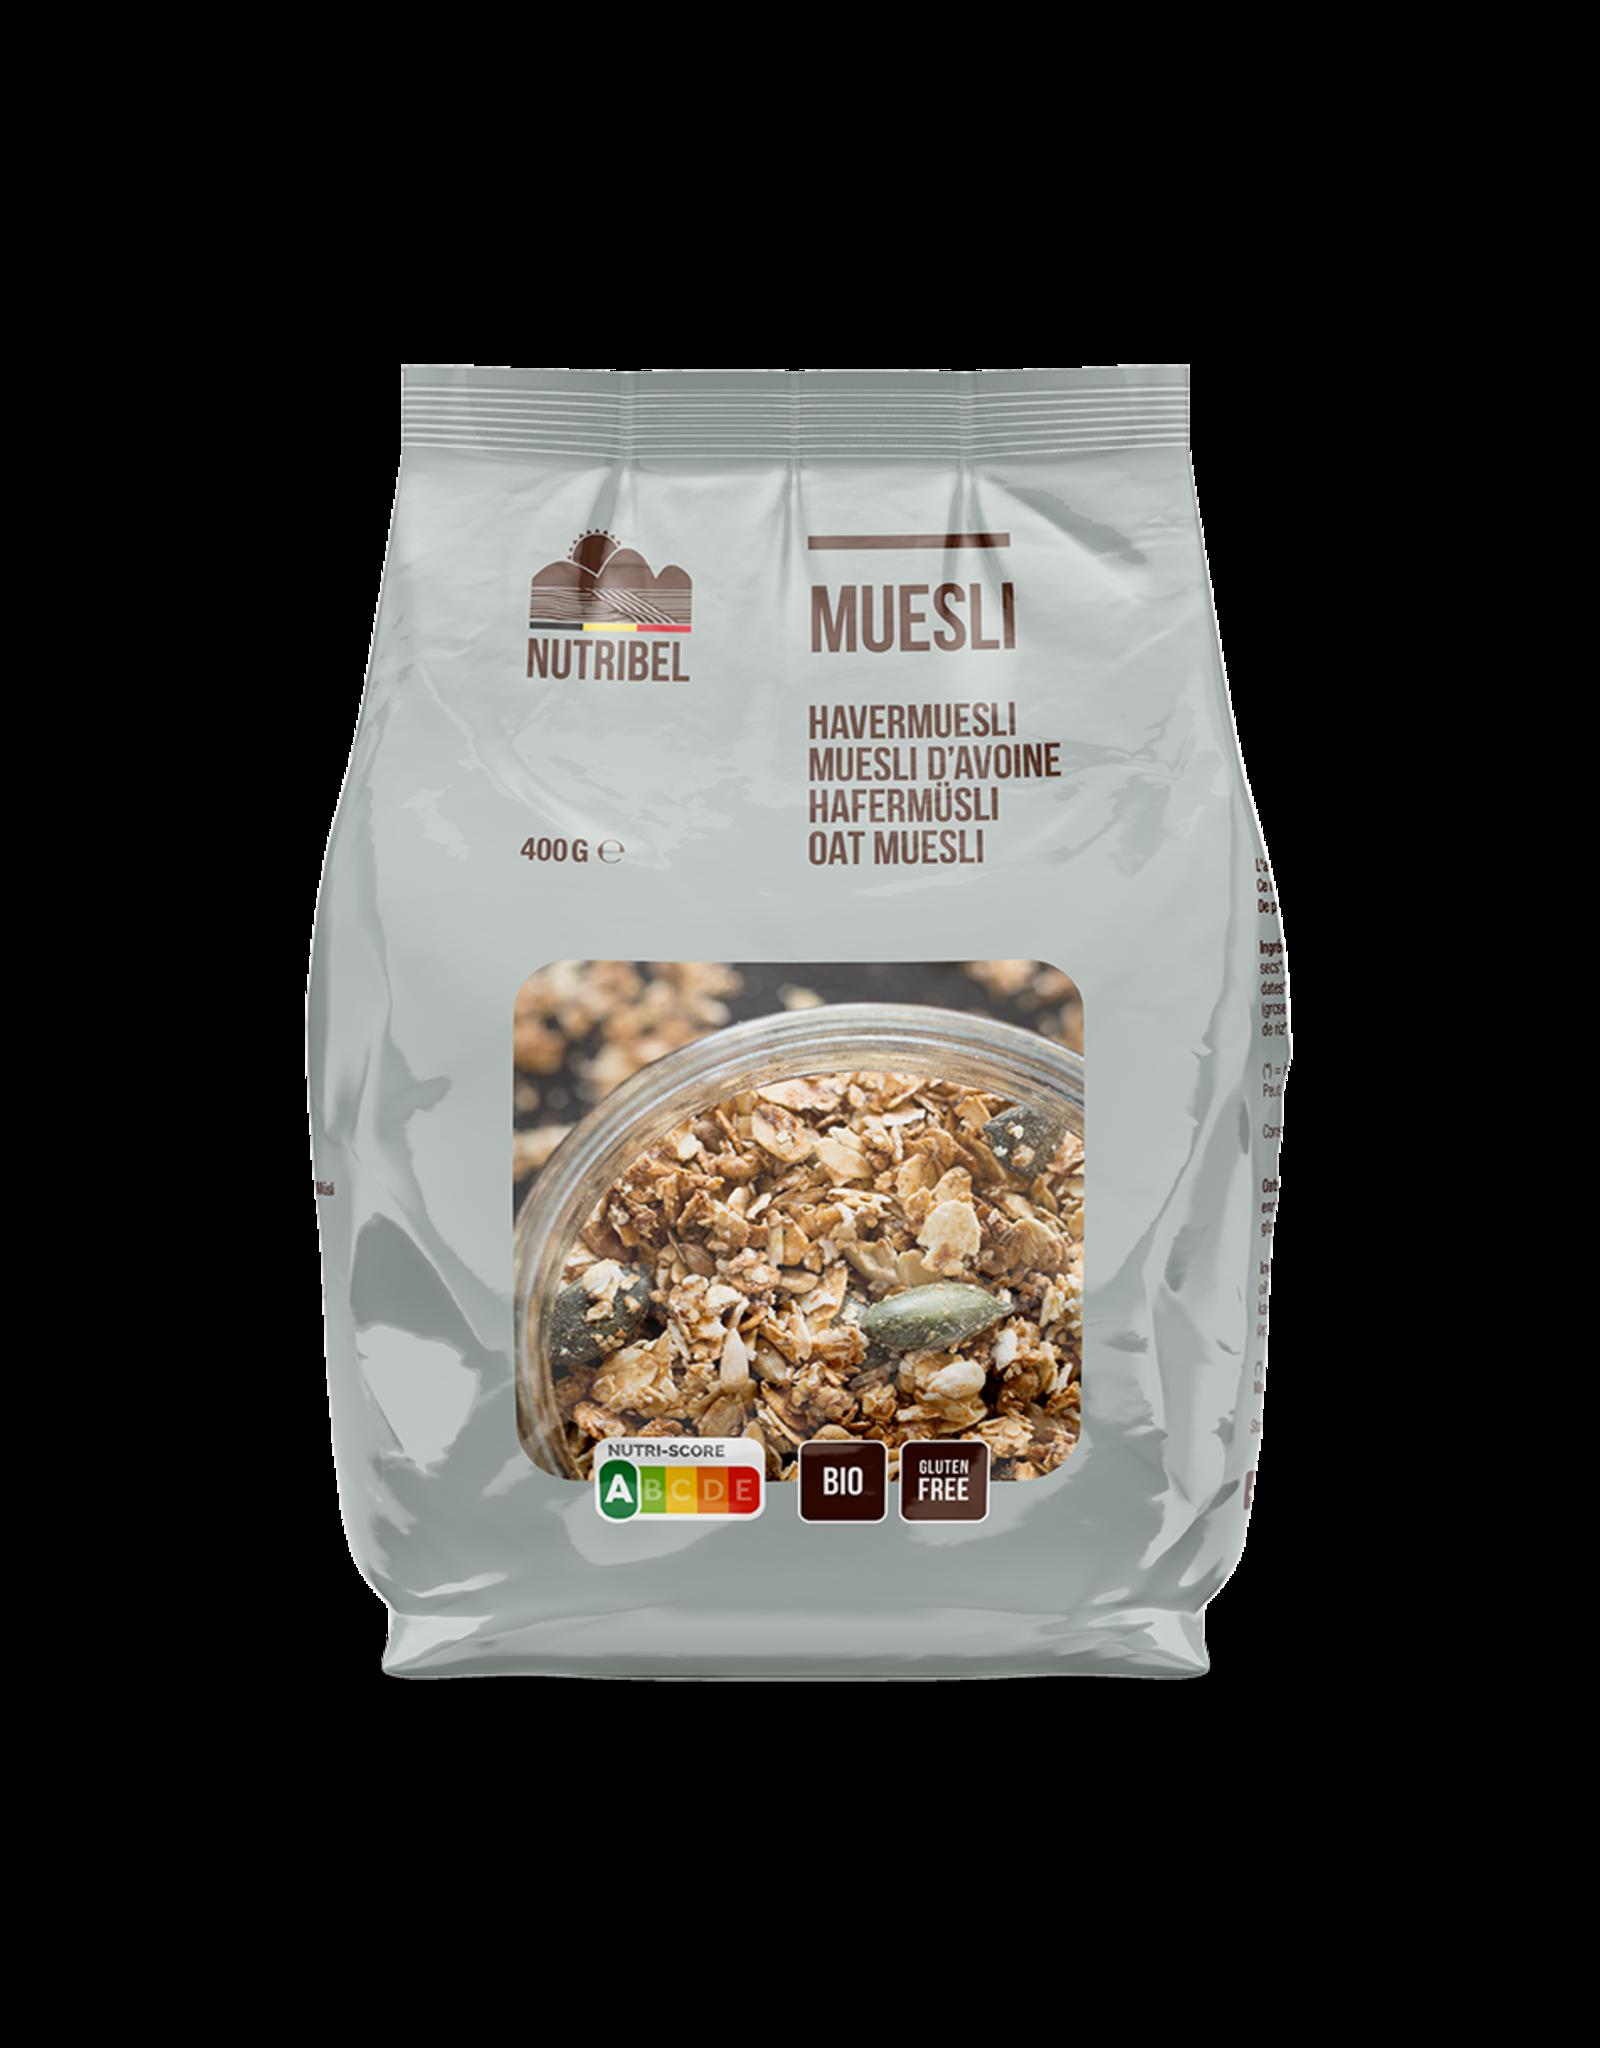 Nutribel Havermuesli bio & glutenvrij 400g